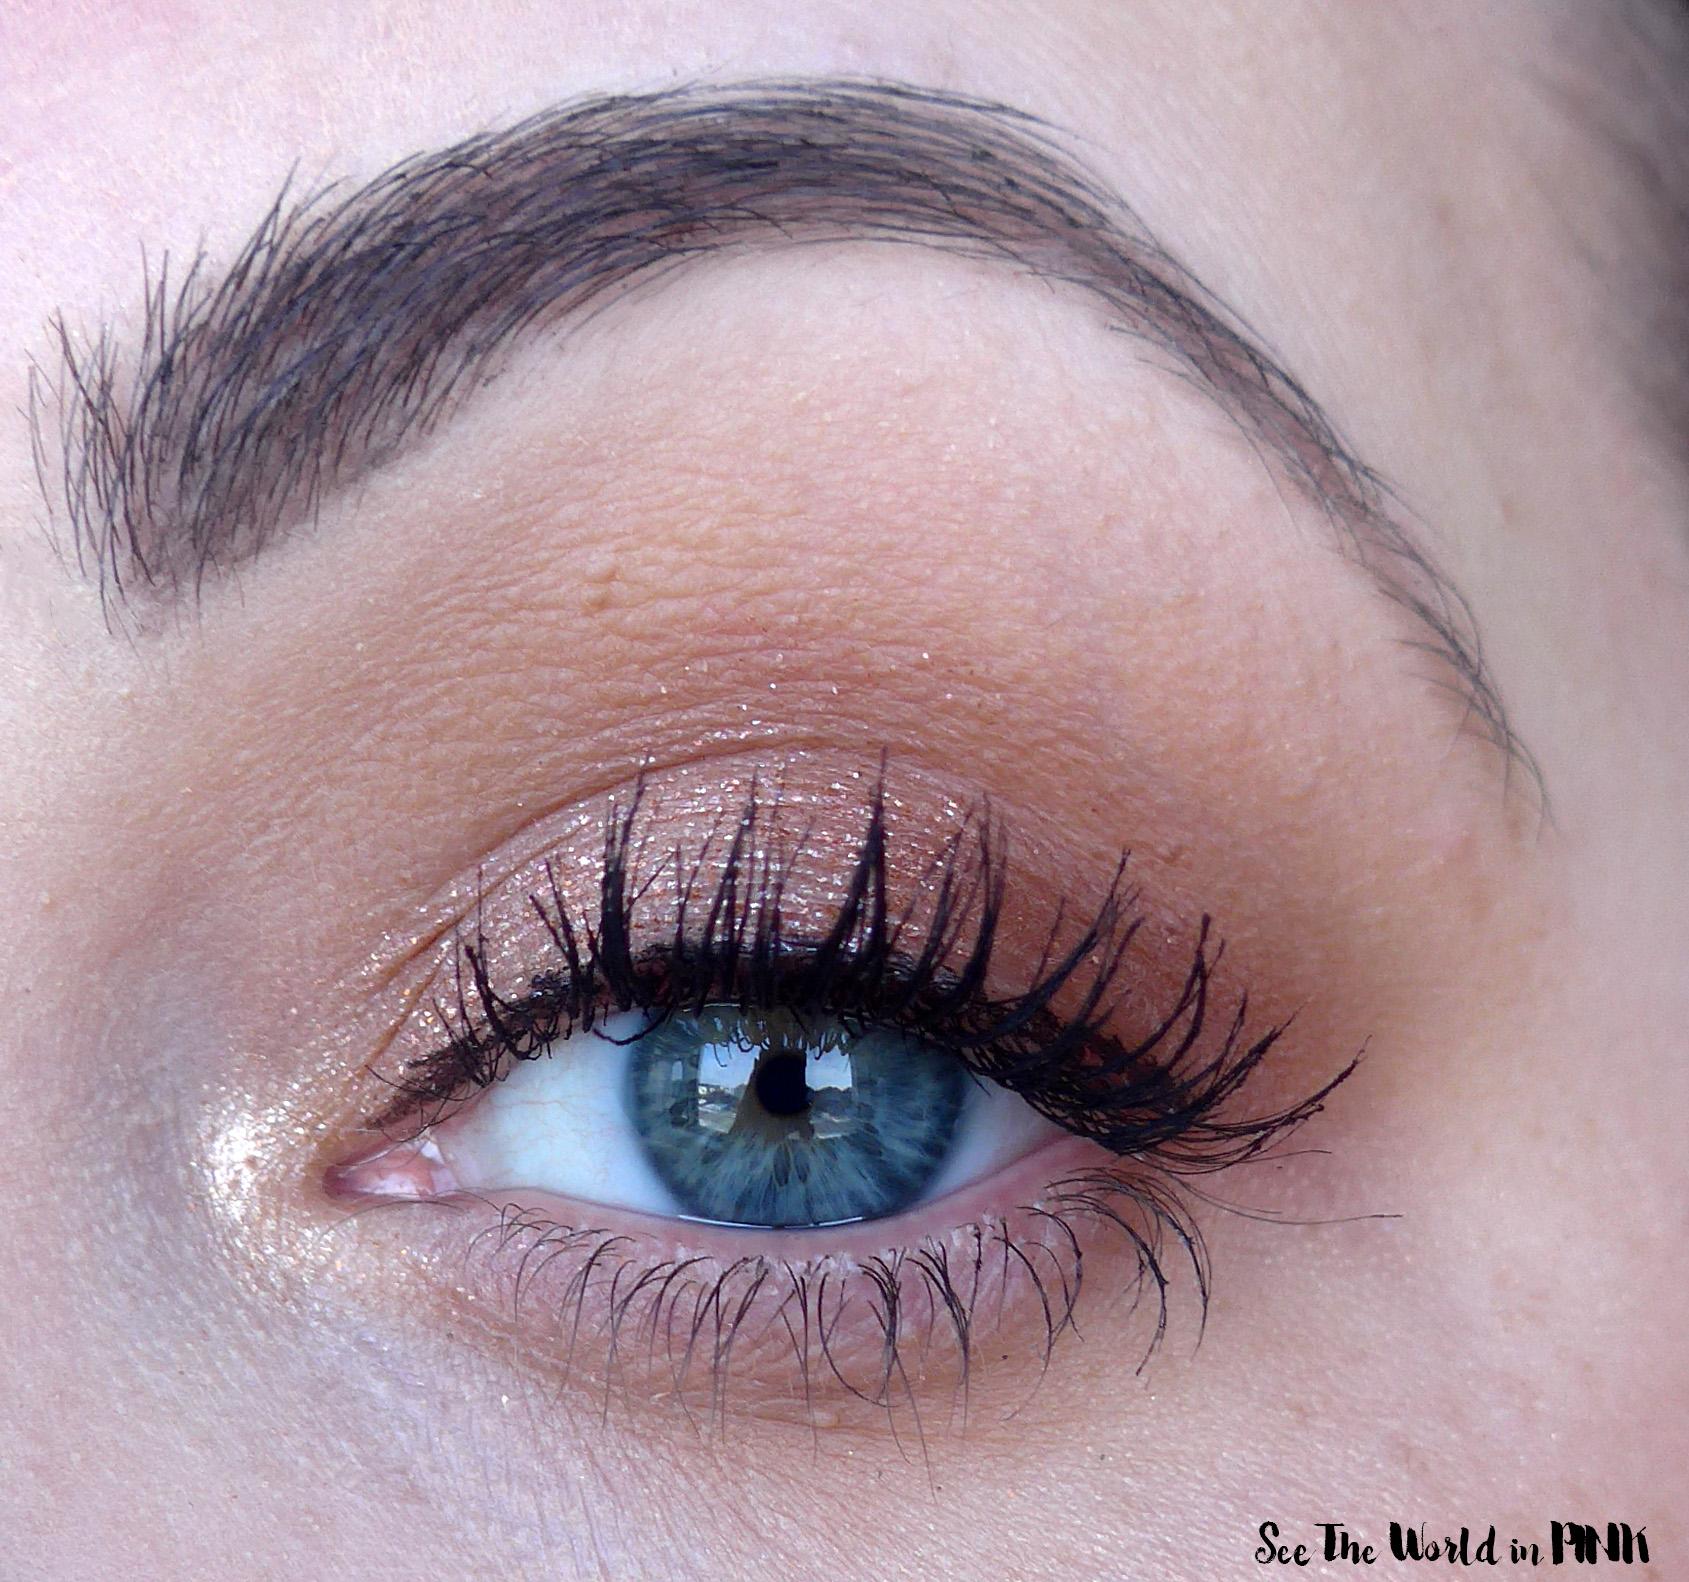 Nabla Side by Side Eyeshadow Palette, Ruby Lights Glitter Quad, Major Pleasure Mascara and Ruby Brush Set